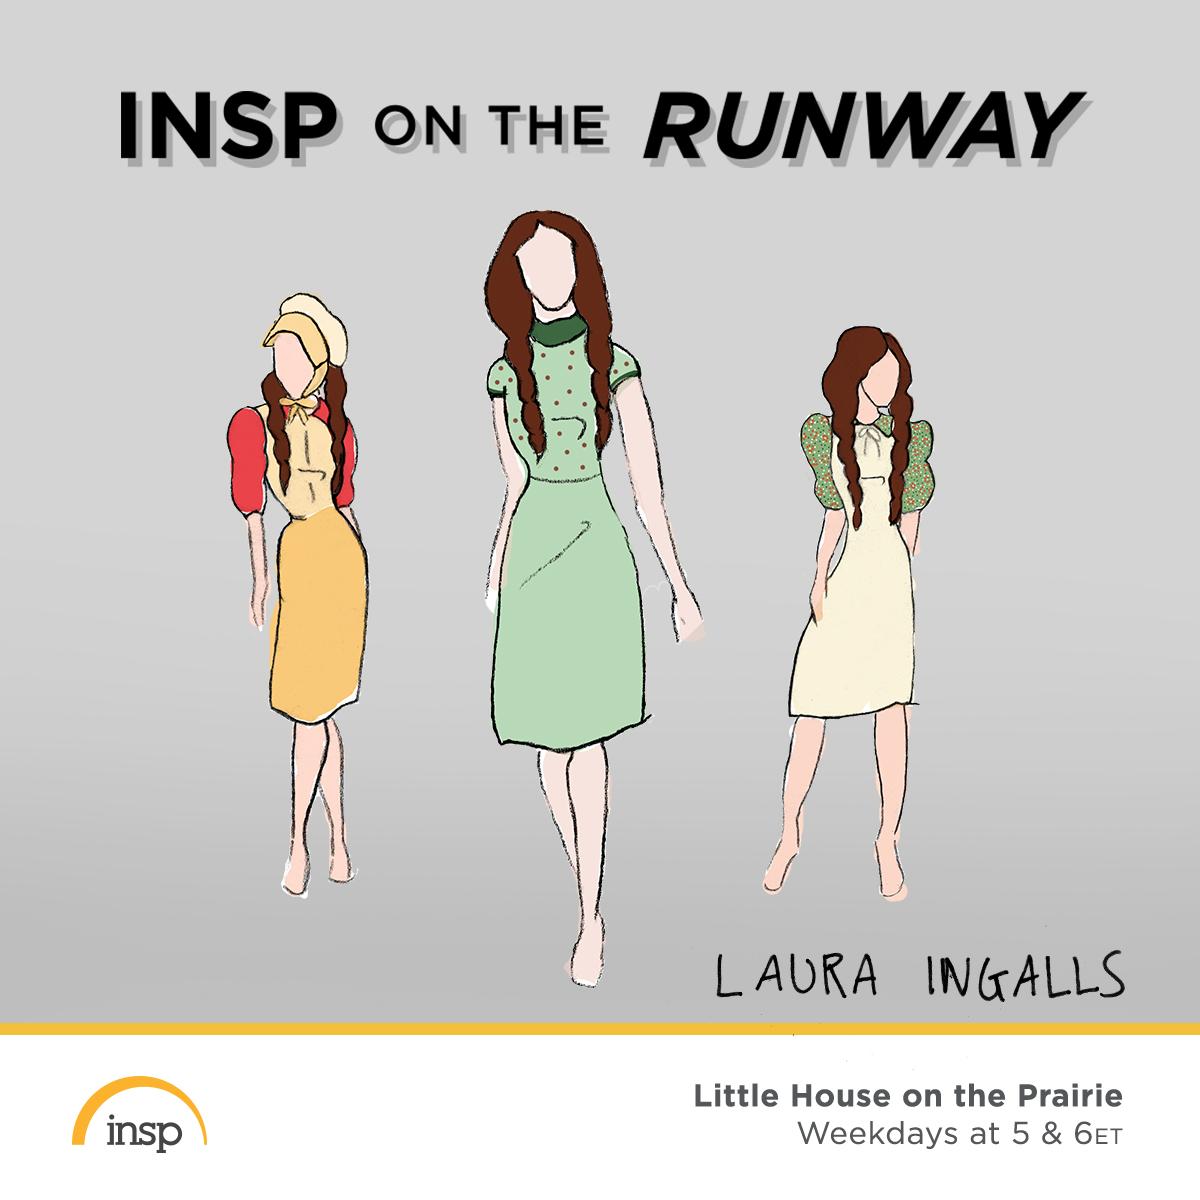 15-IM-0424-FashionWeekBlogPost-LauraIngalls-1200x1200